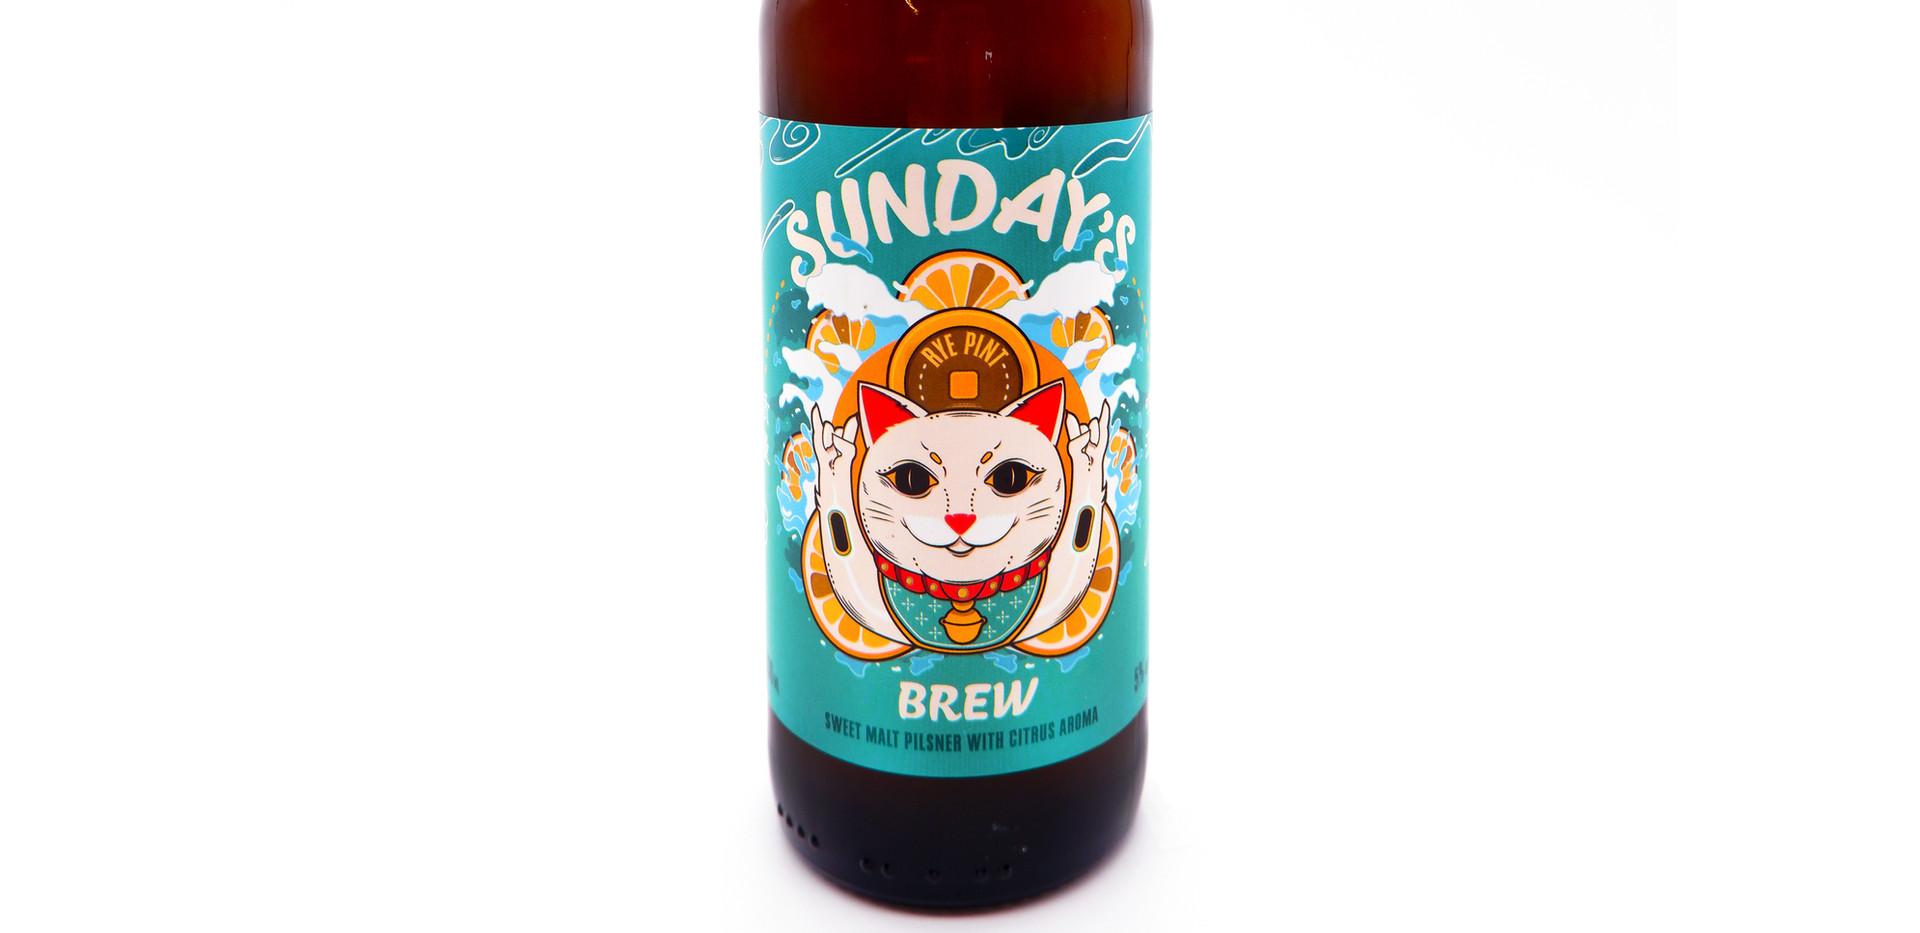 Sunday's Brew Pilsner